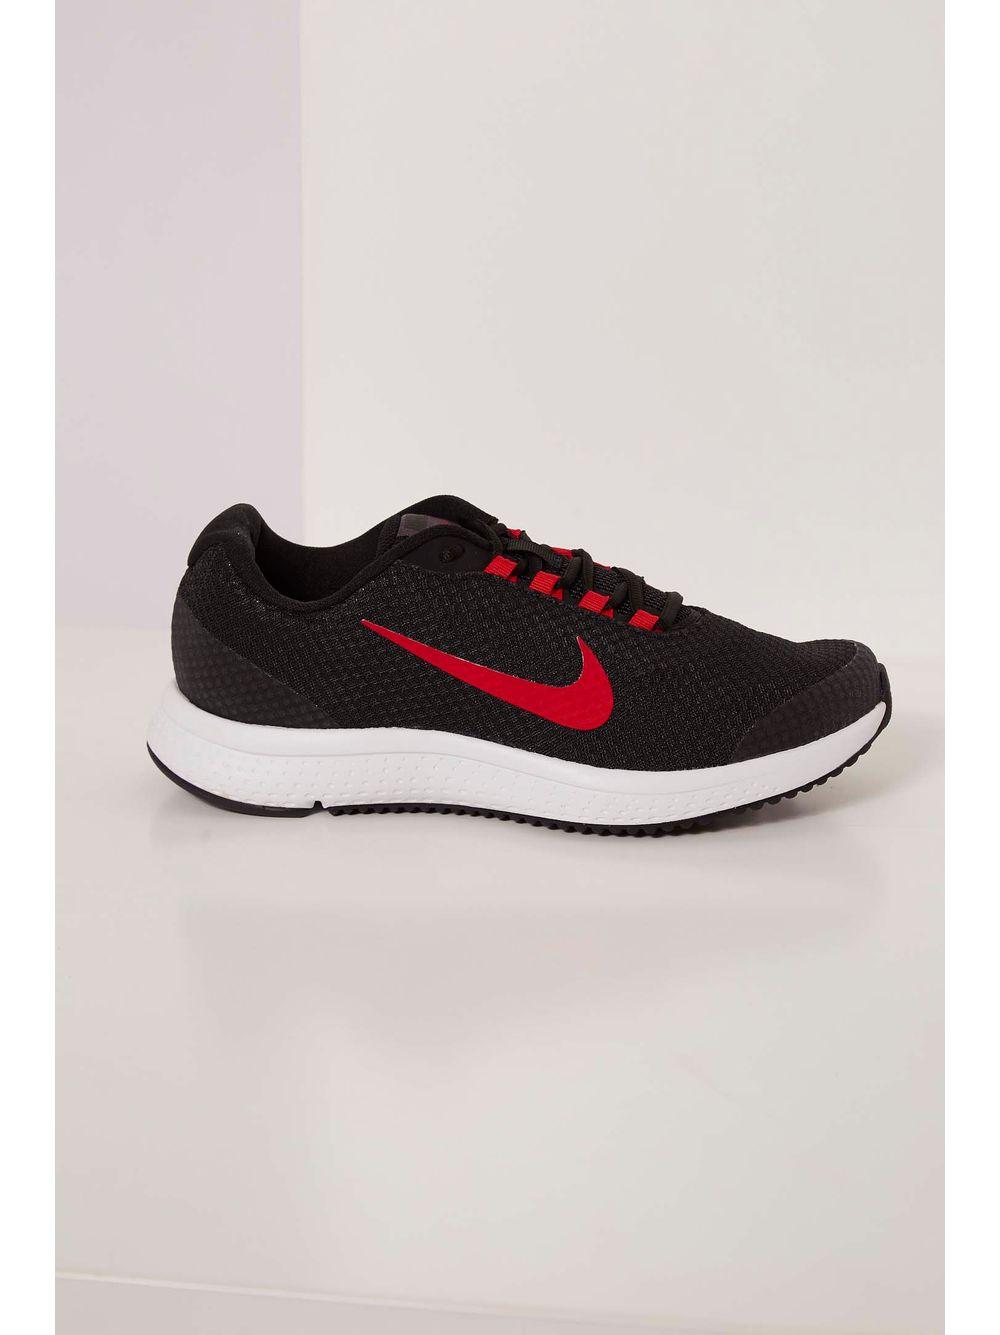 Tênis Nike Runallday Preto - pittol 1b3d03d1e41b0